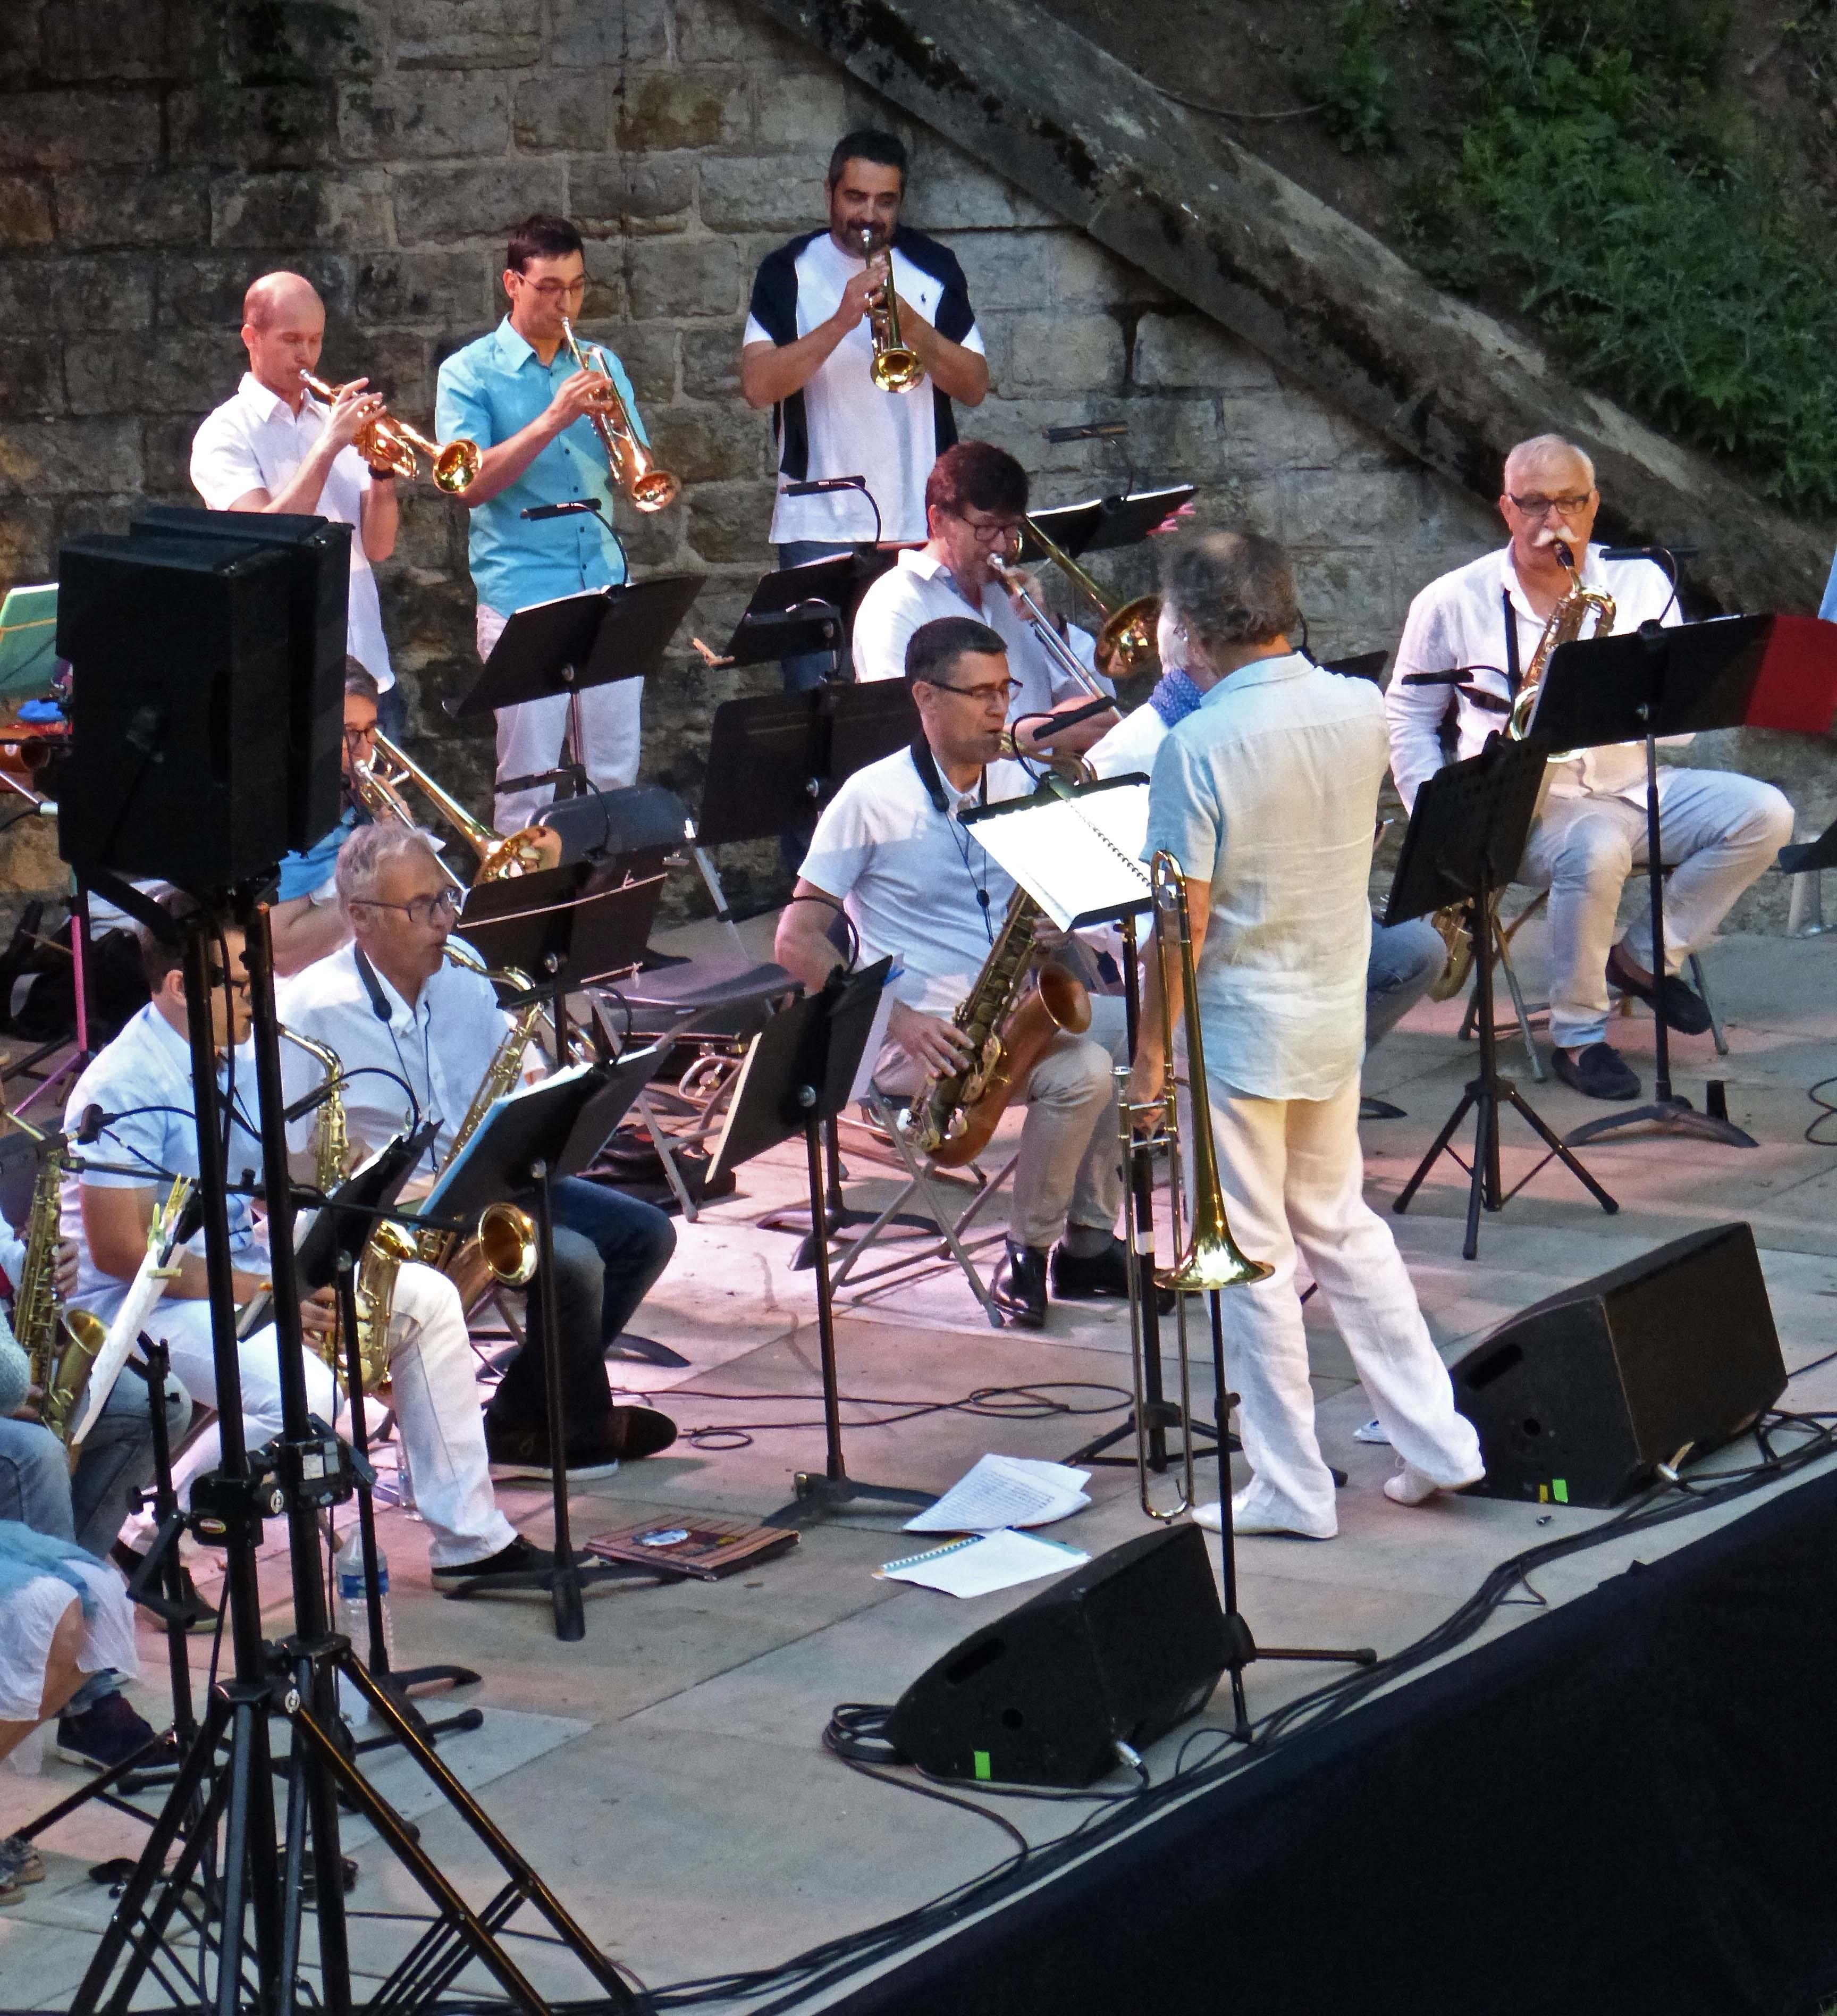 12_Concert Jazz_22_M Hare 1